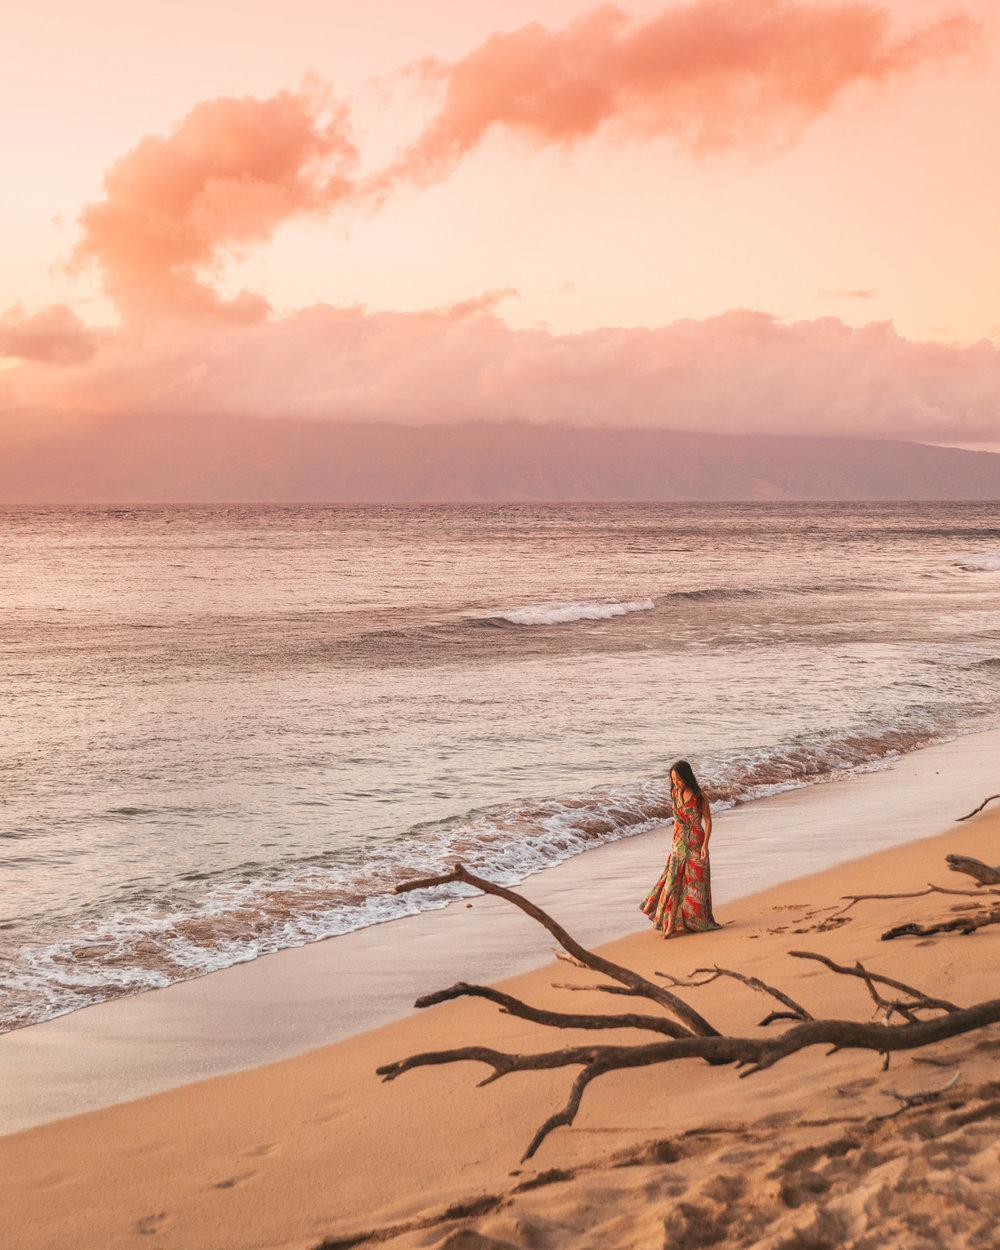 Sunset on Ka'anapali Beach at Westin Nanea // The Quick Guide to Visiting Maui, Hawaii #readysetjetset #hawaii #maui